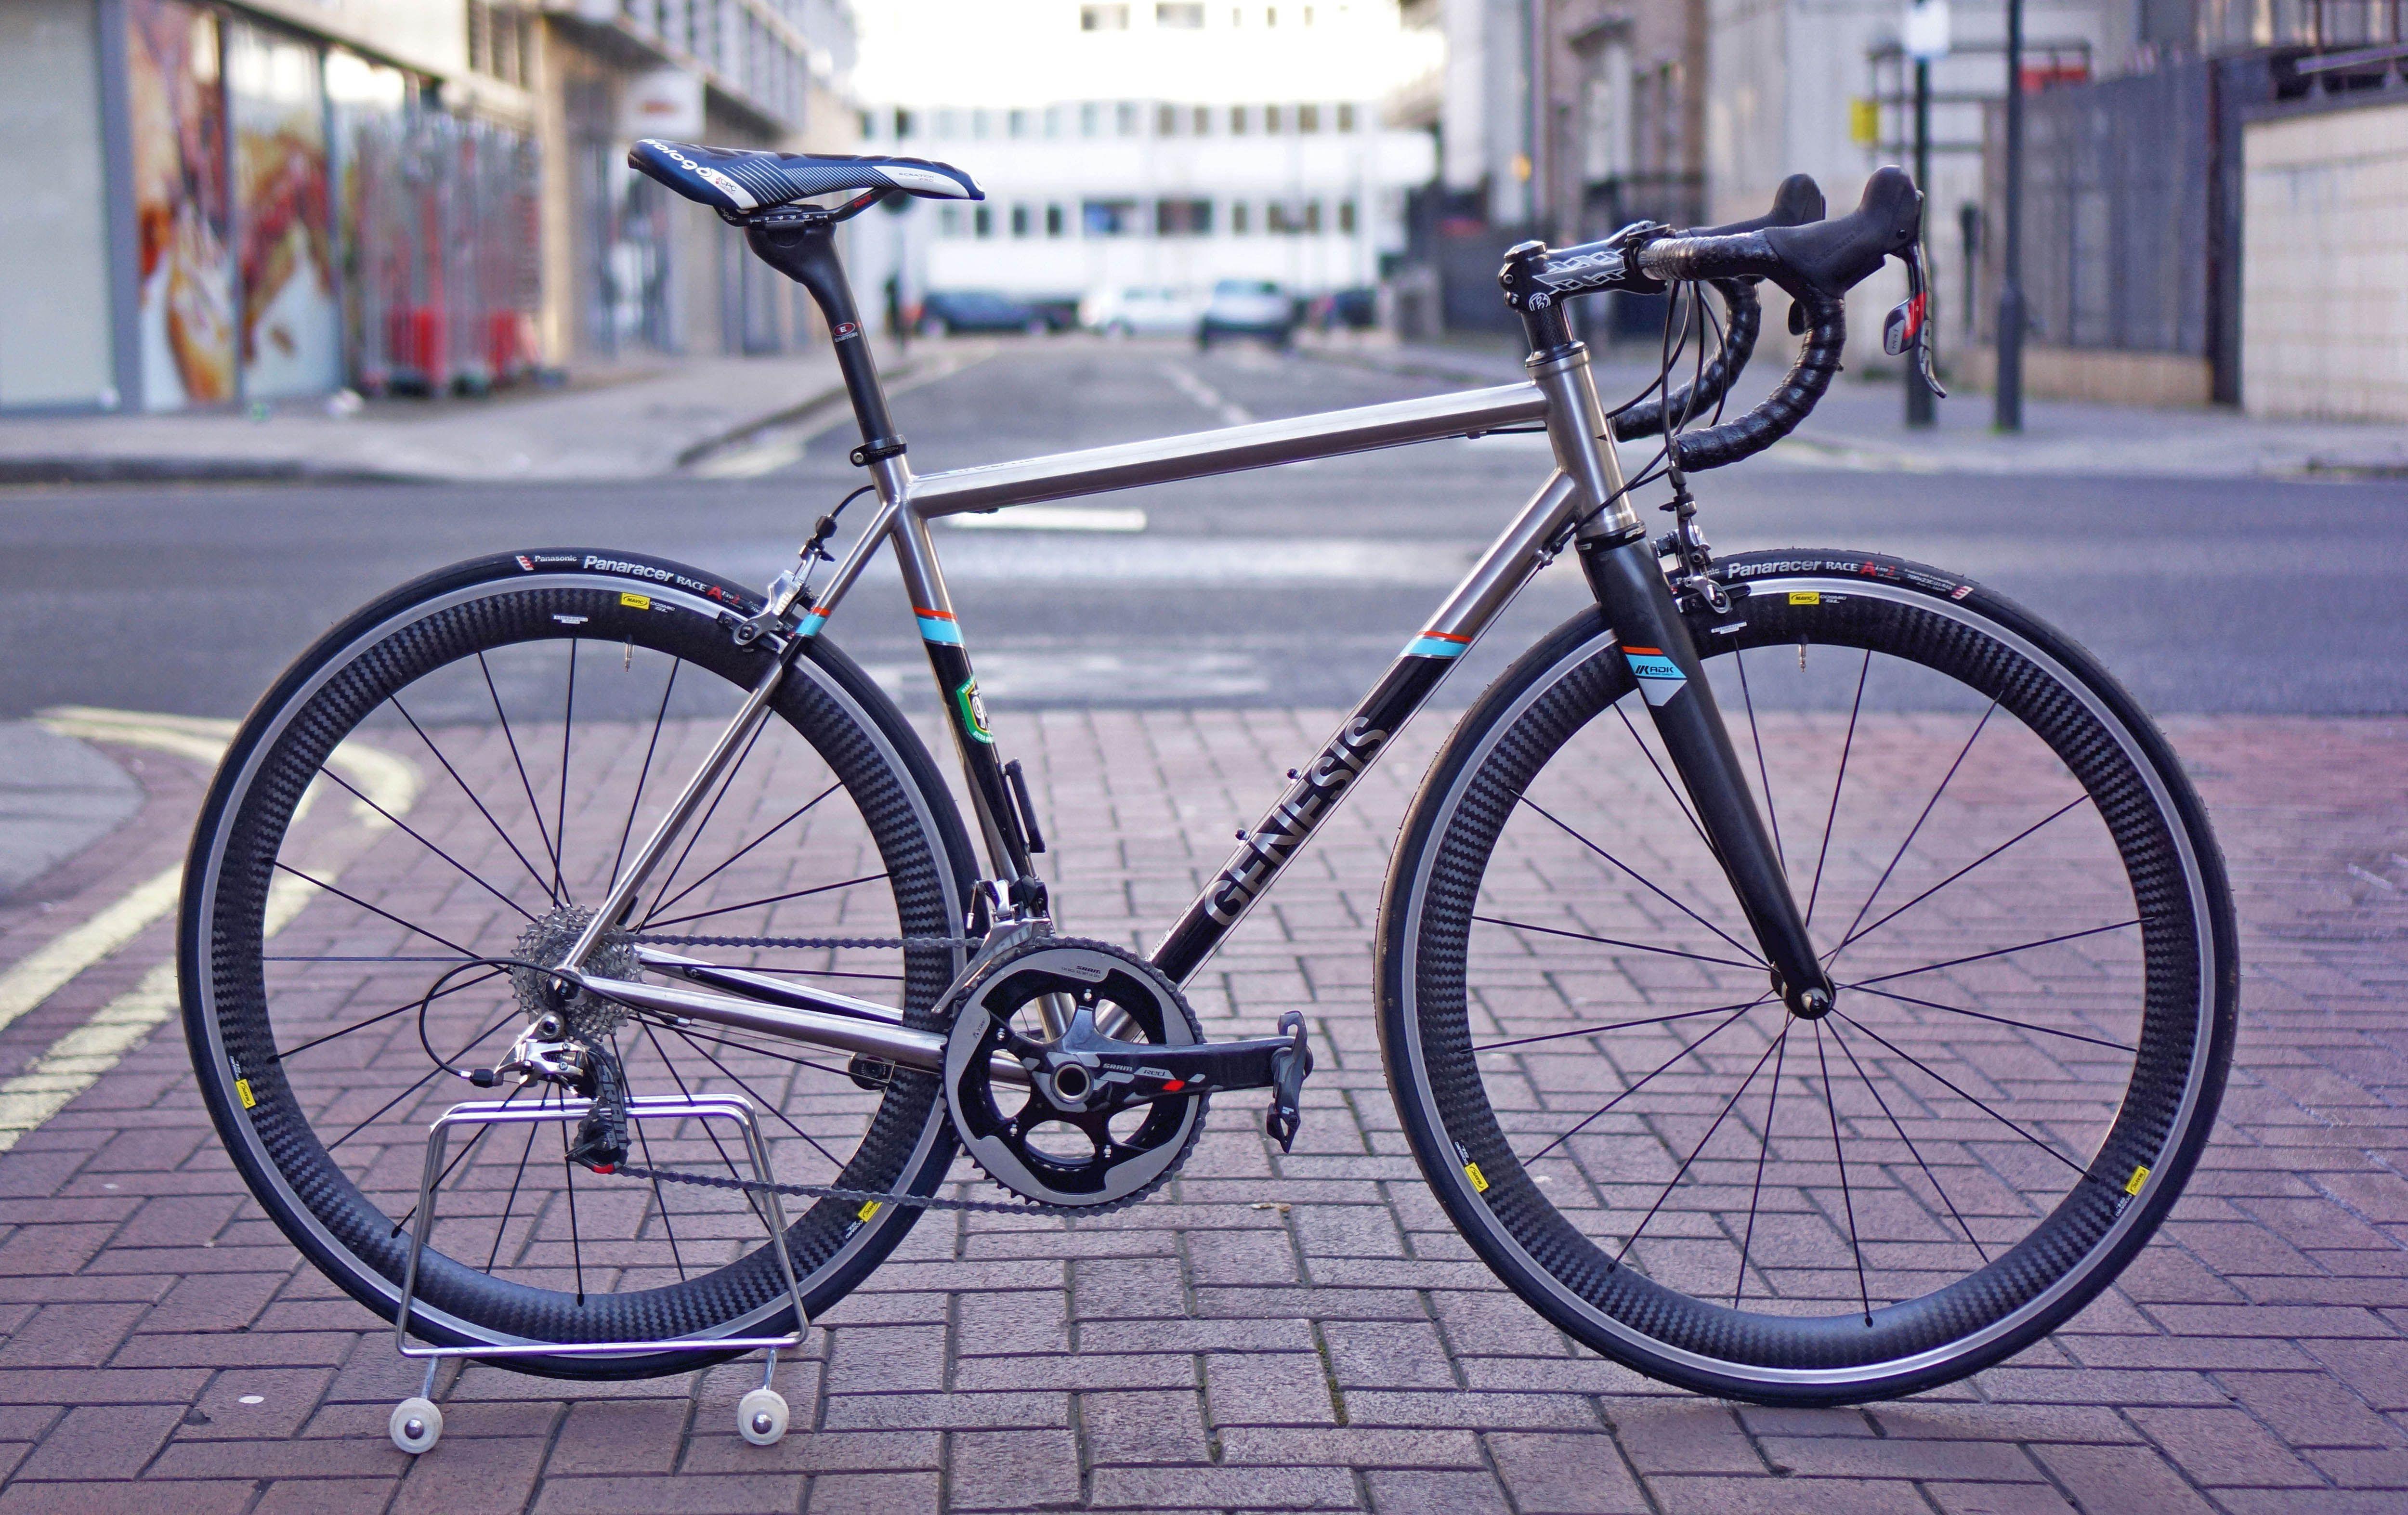 Genesis Volare 953 Bicycle Bike Road Bike